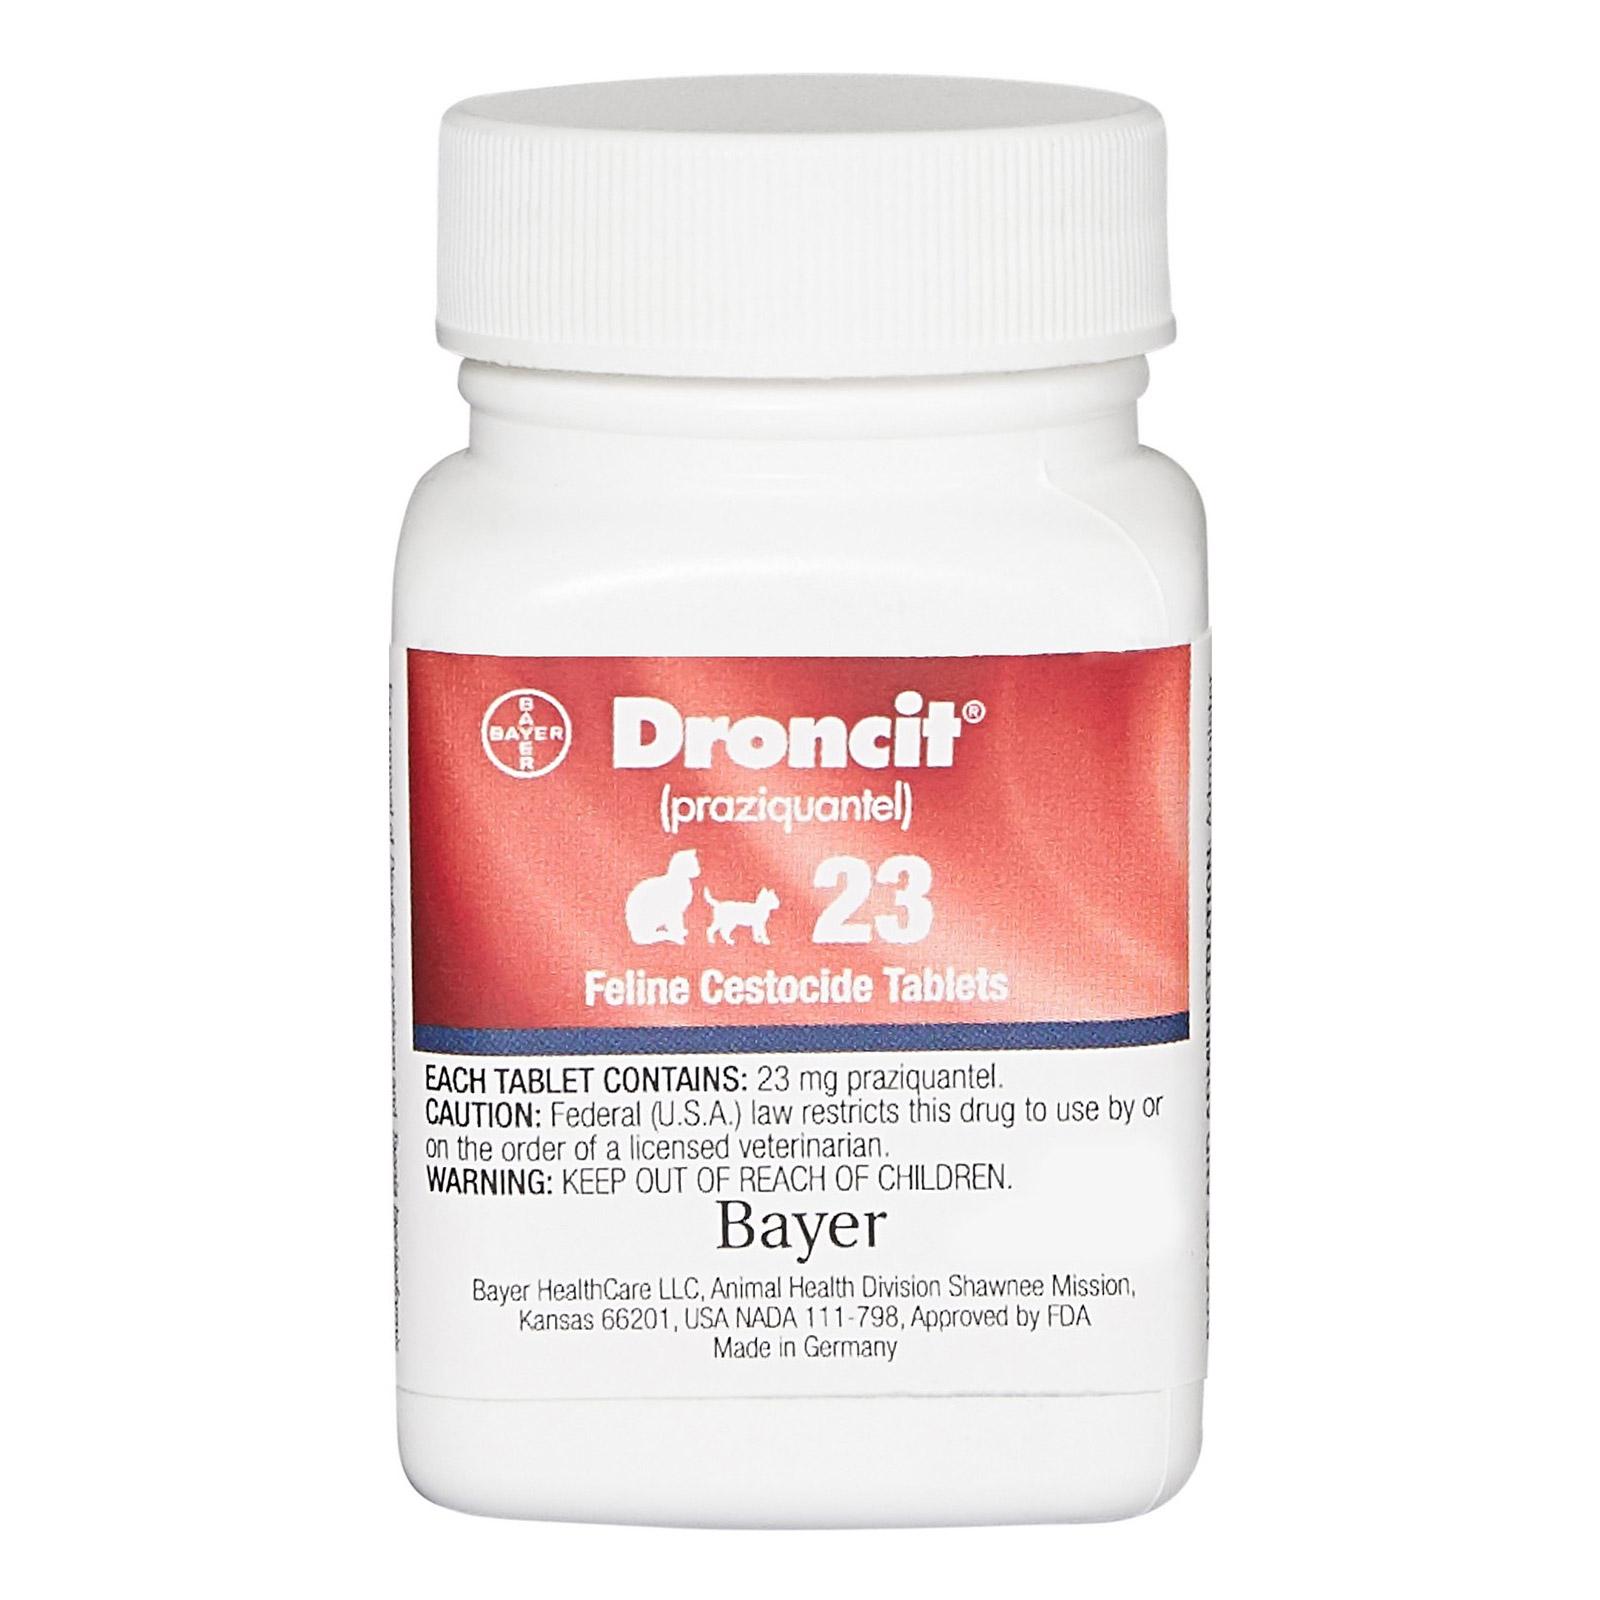 Droncit Tapewormer For Cats 4 Tablet Pet Pest & Medical Supplies